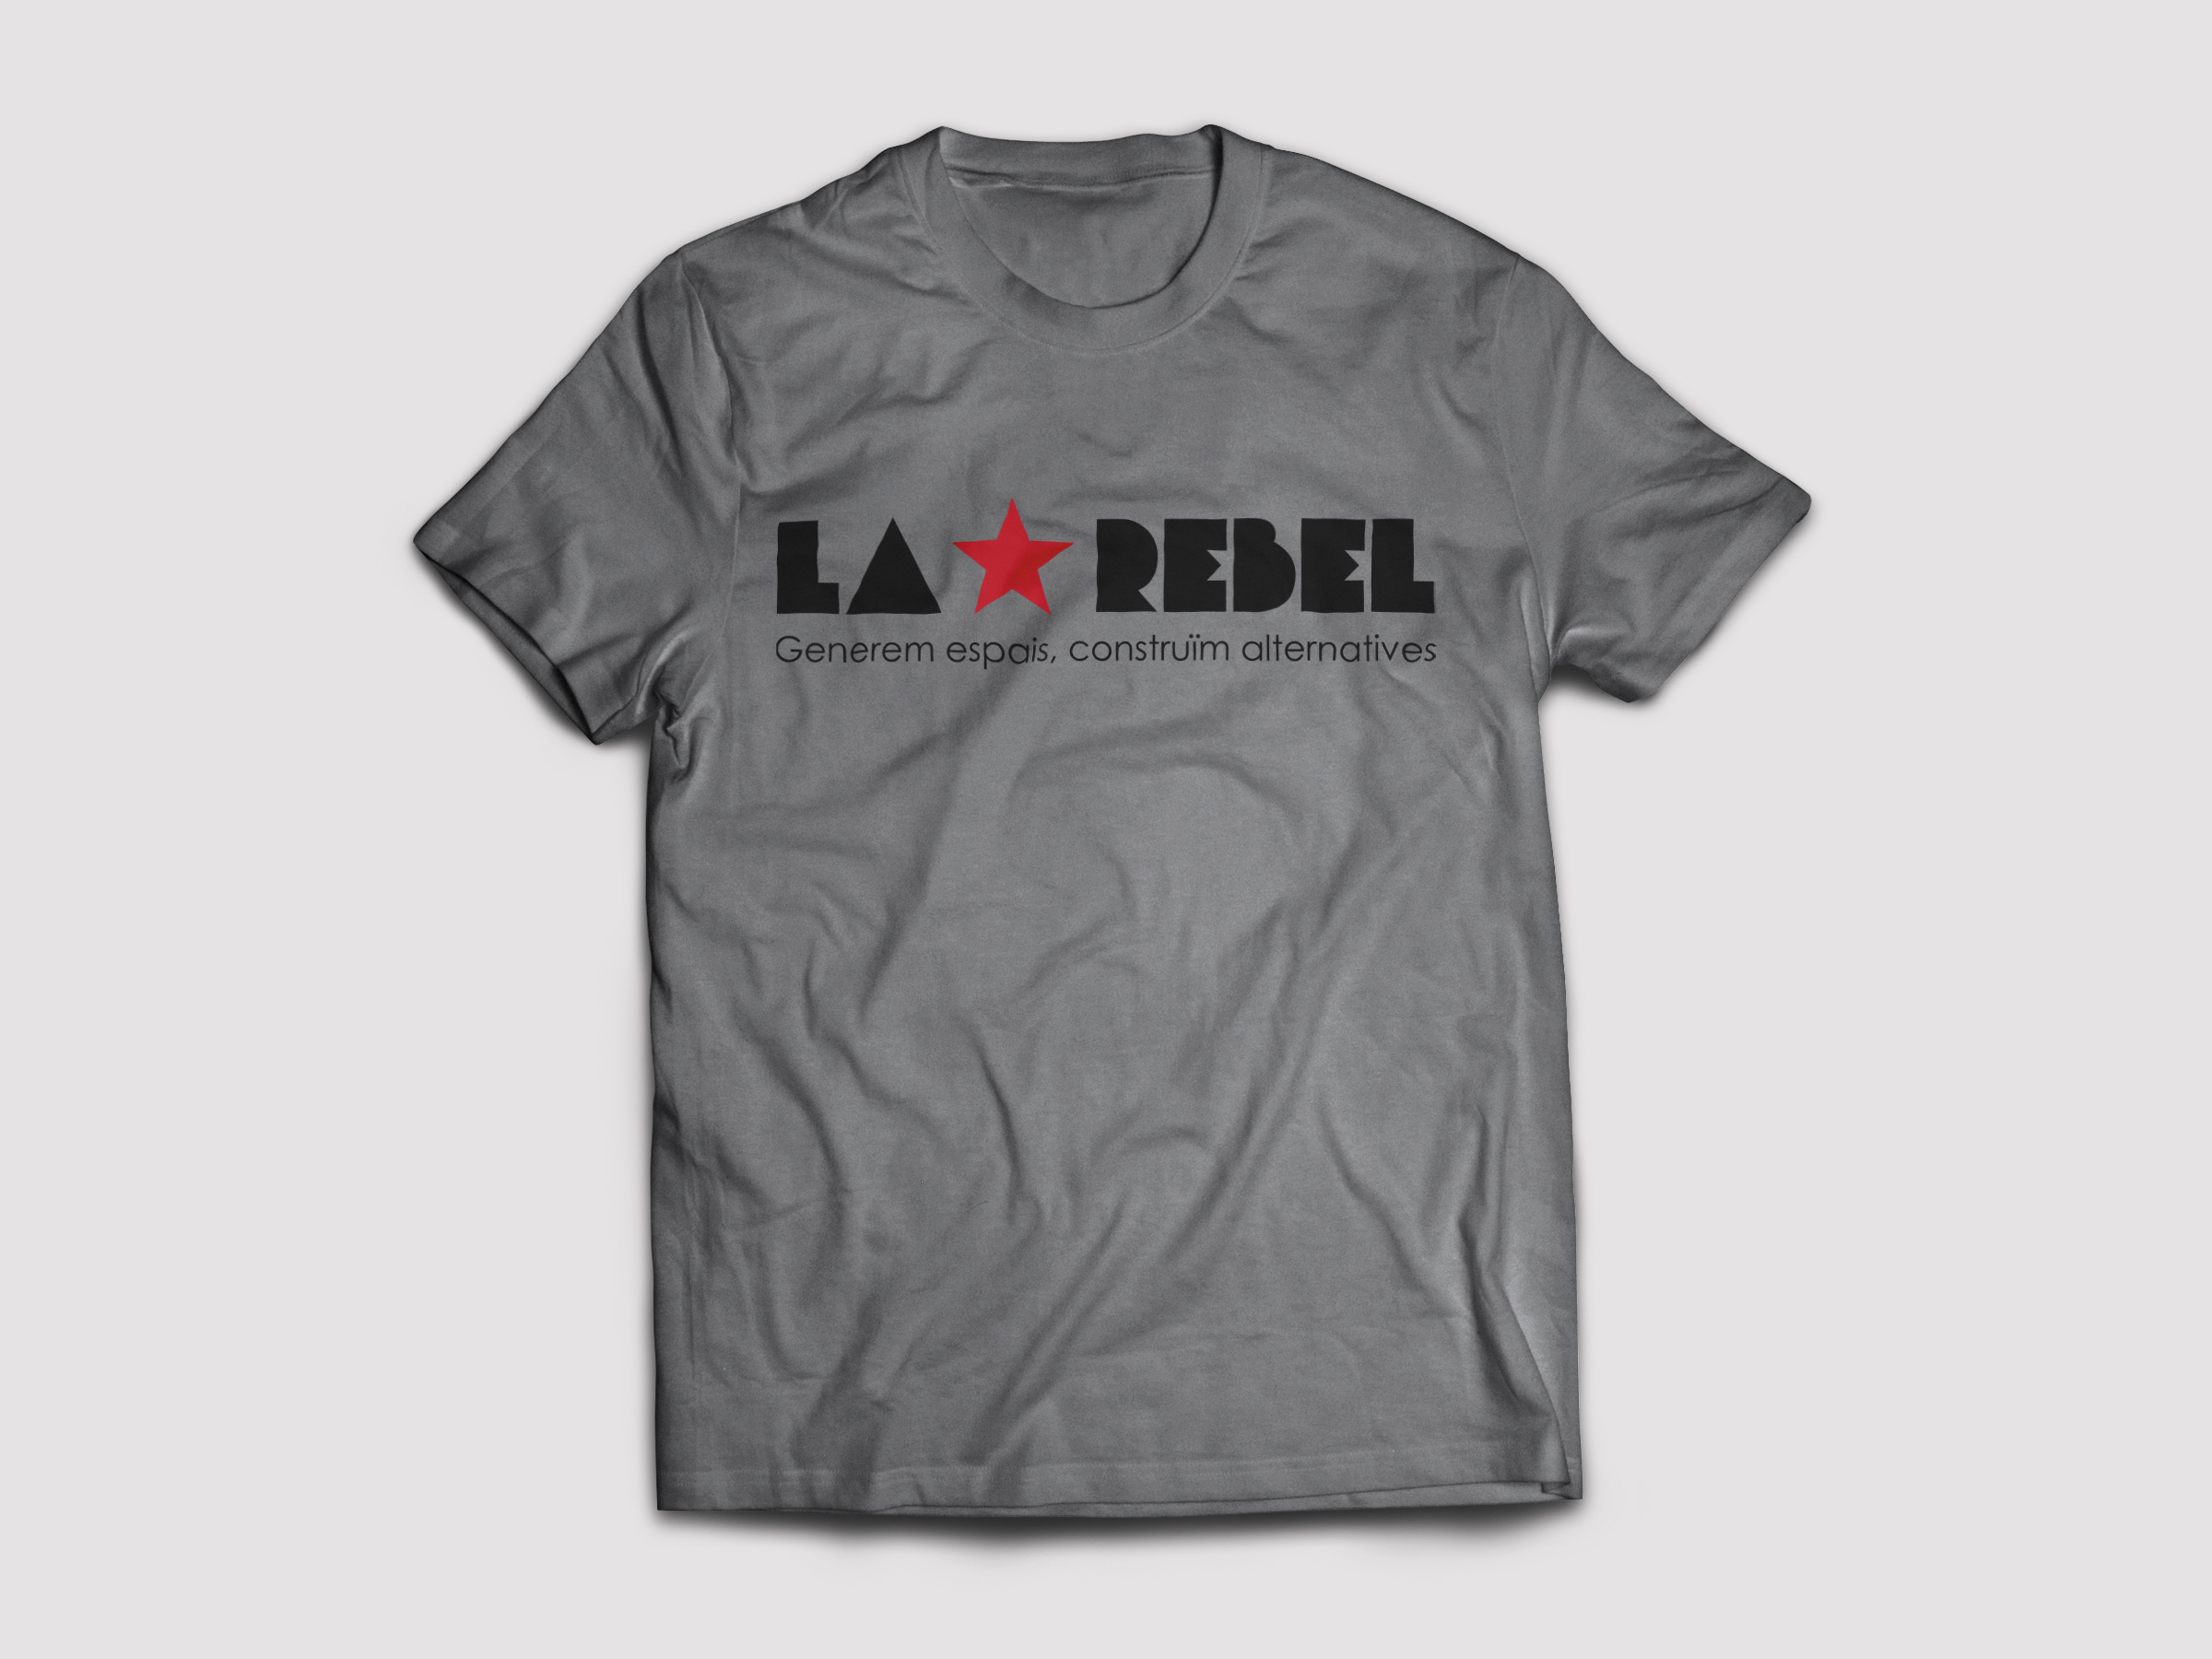 archicercle - camiseta la rebel